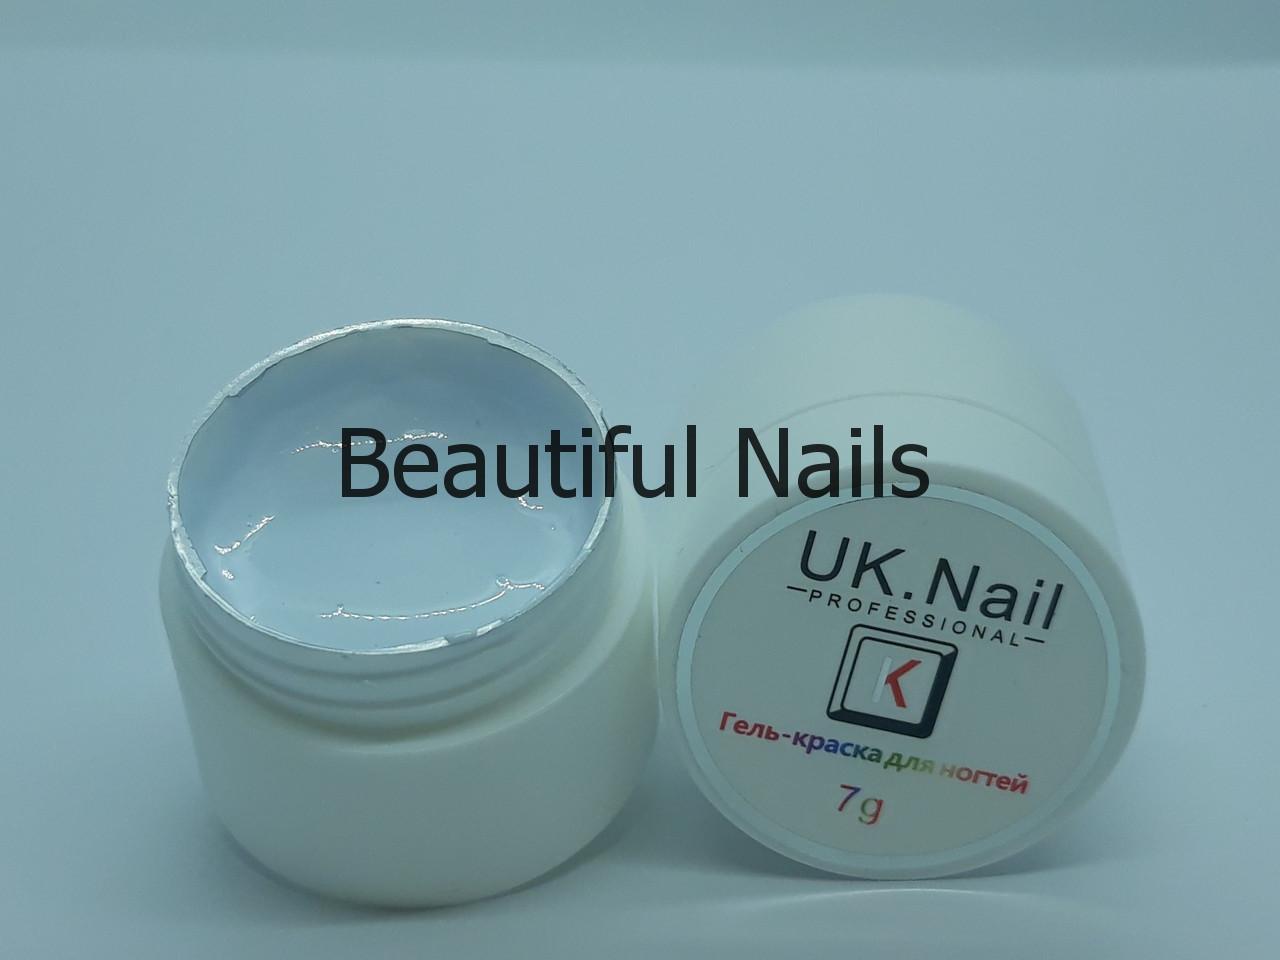 Гель-краска для ногтей UK.Nail №01 цвет белый.7 грамм